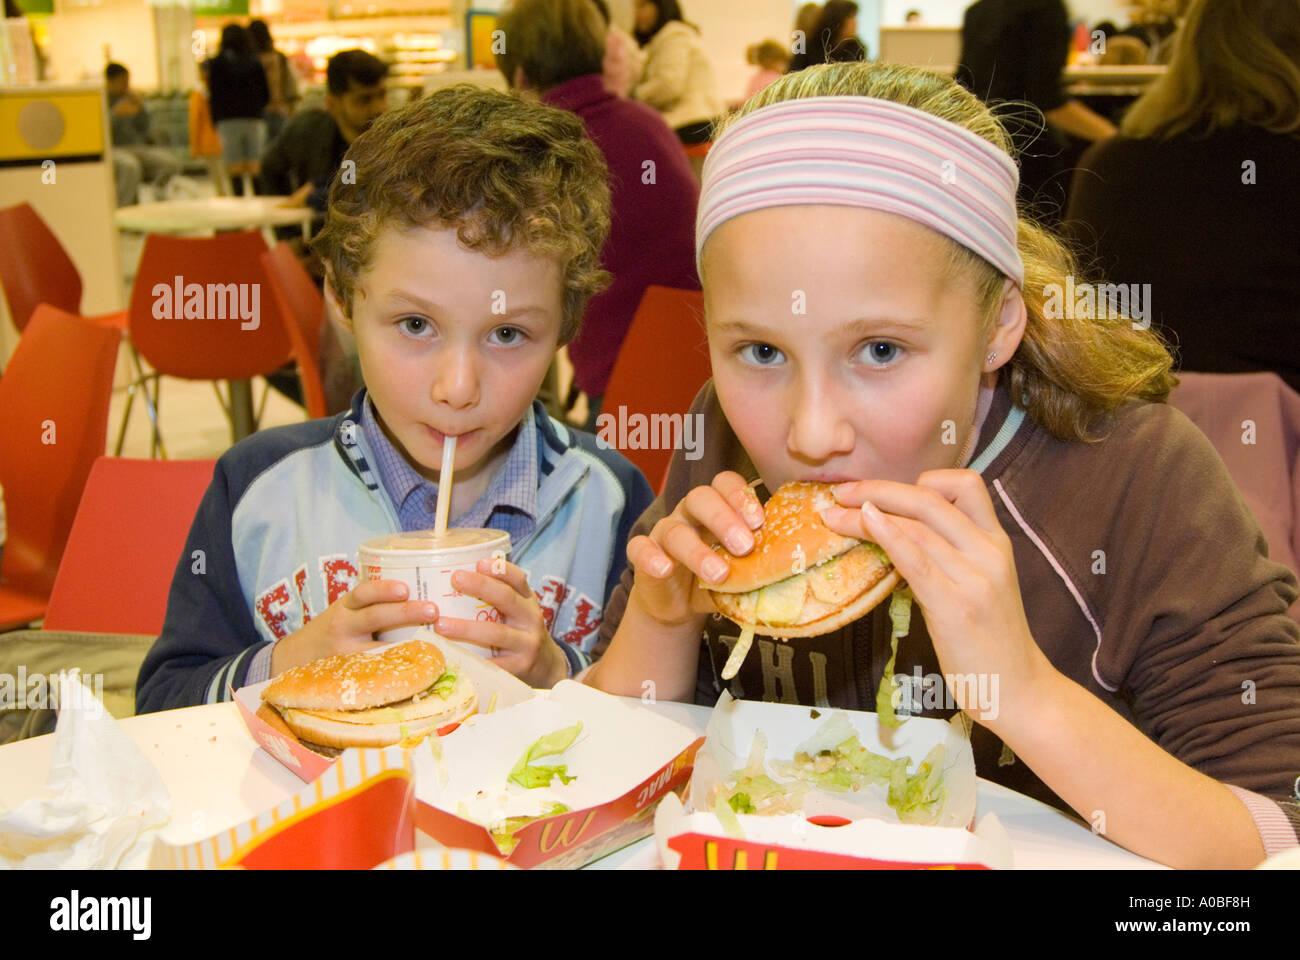 Children eating McDonald's Big Mac hamburgers England UK - Stock Image